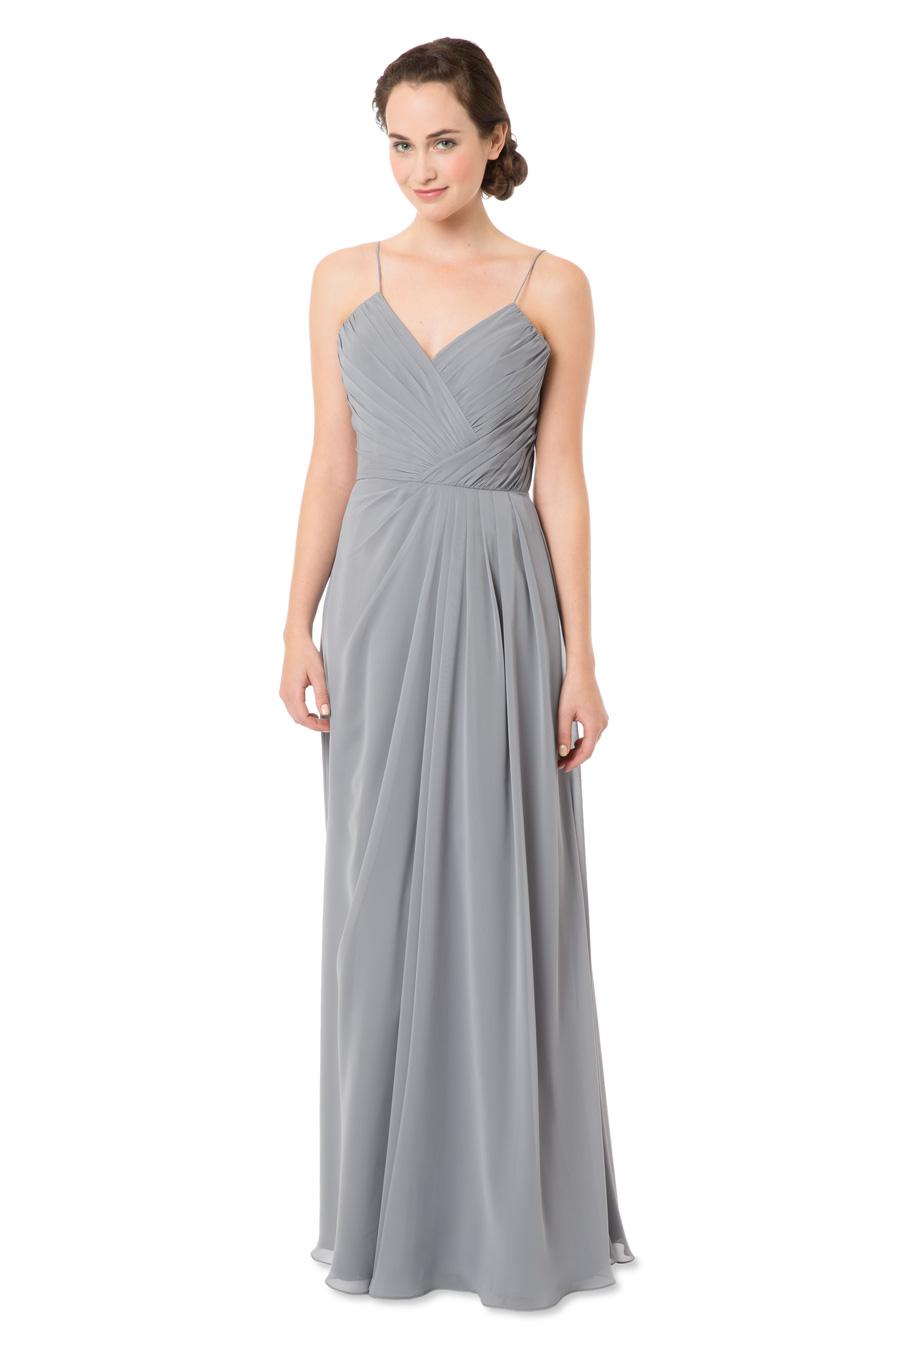 edde2f4c521 Home   Bridesmaid s Dresses   Bari Jay   Bari Jay BC1551. bc1551